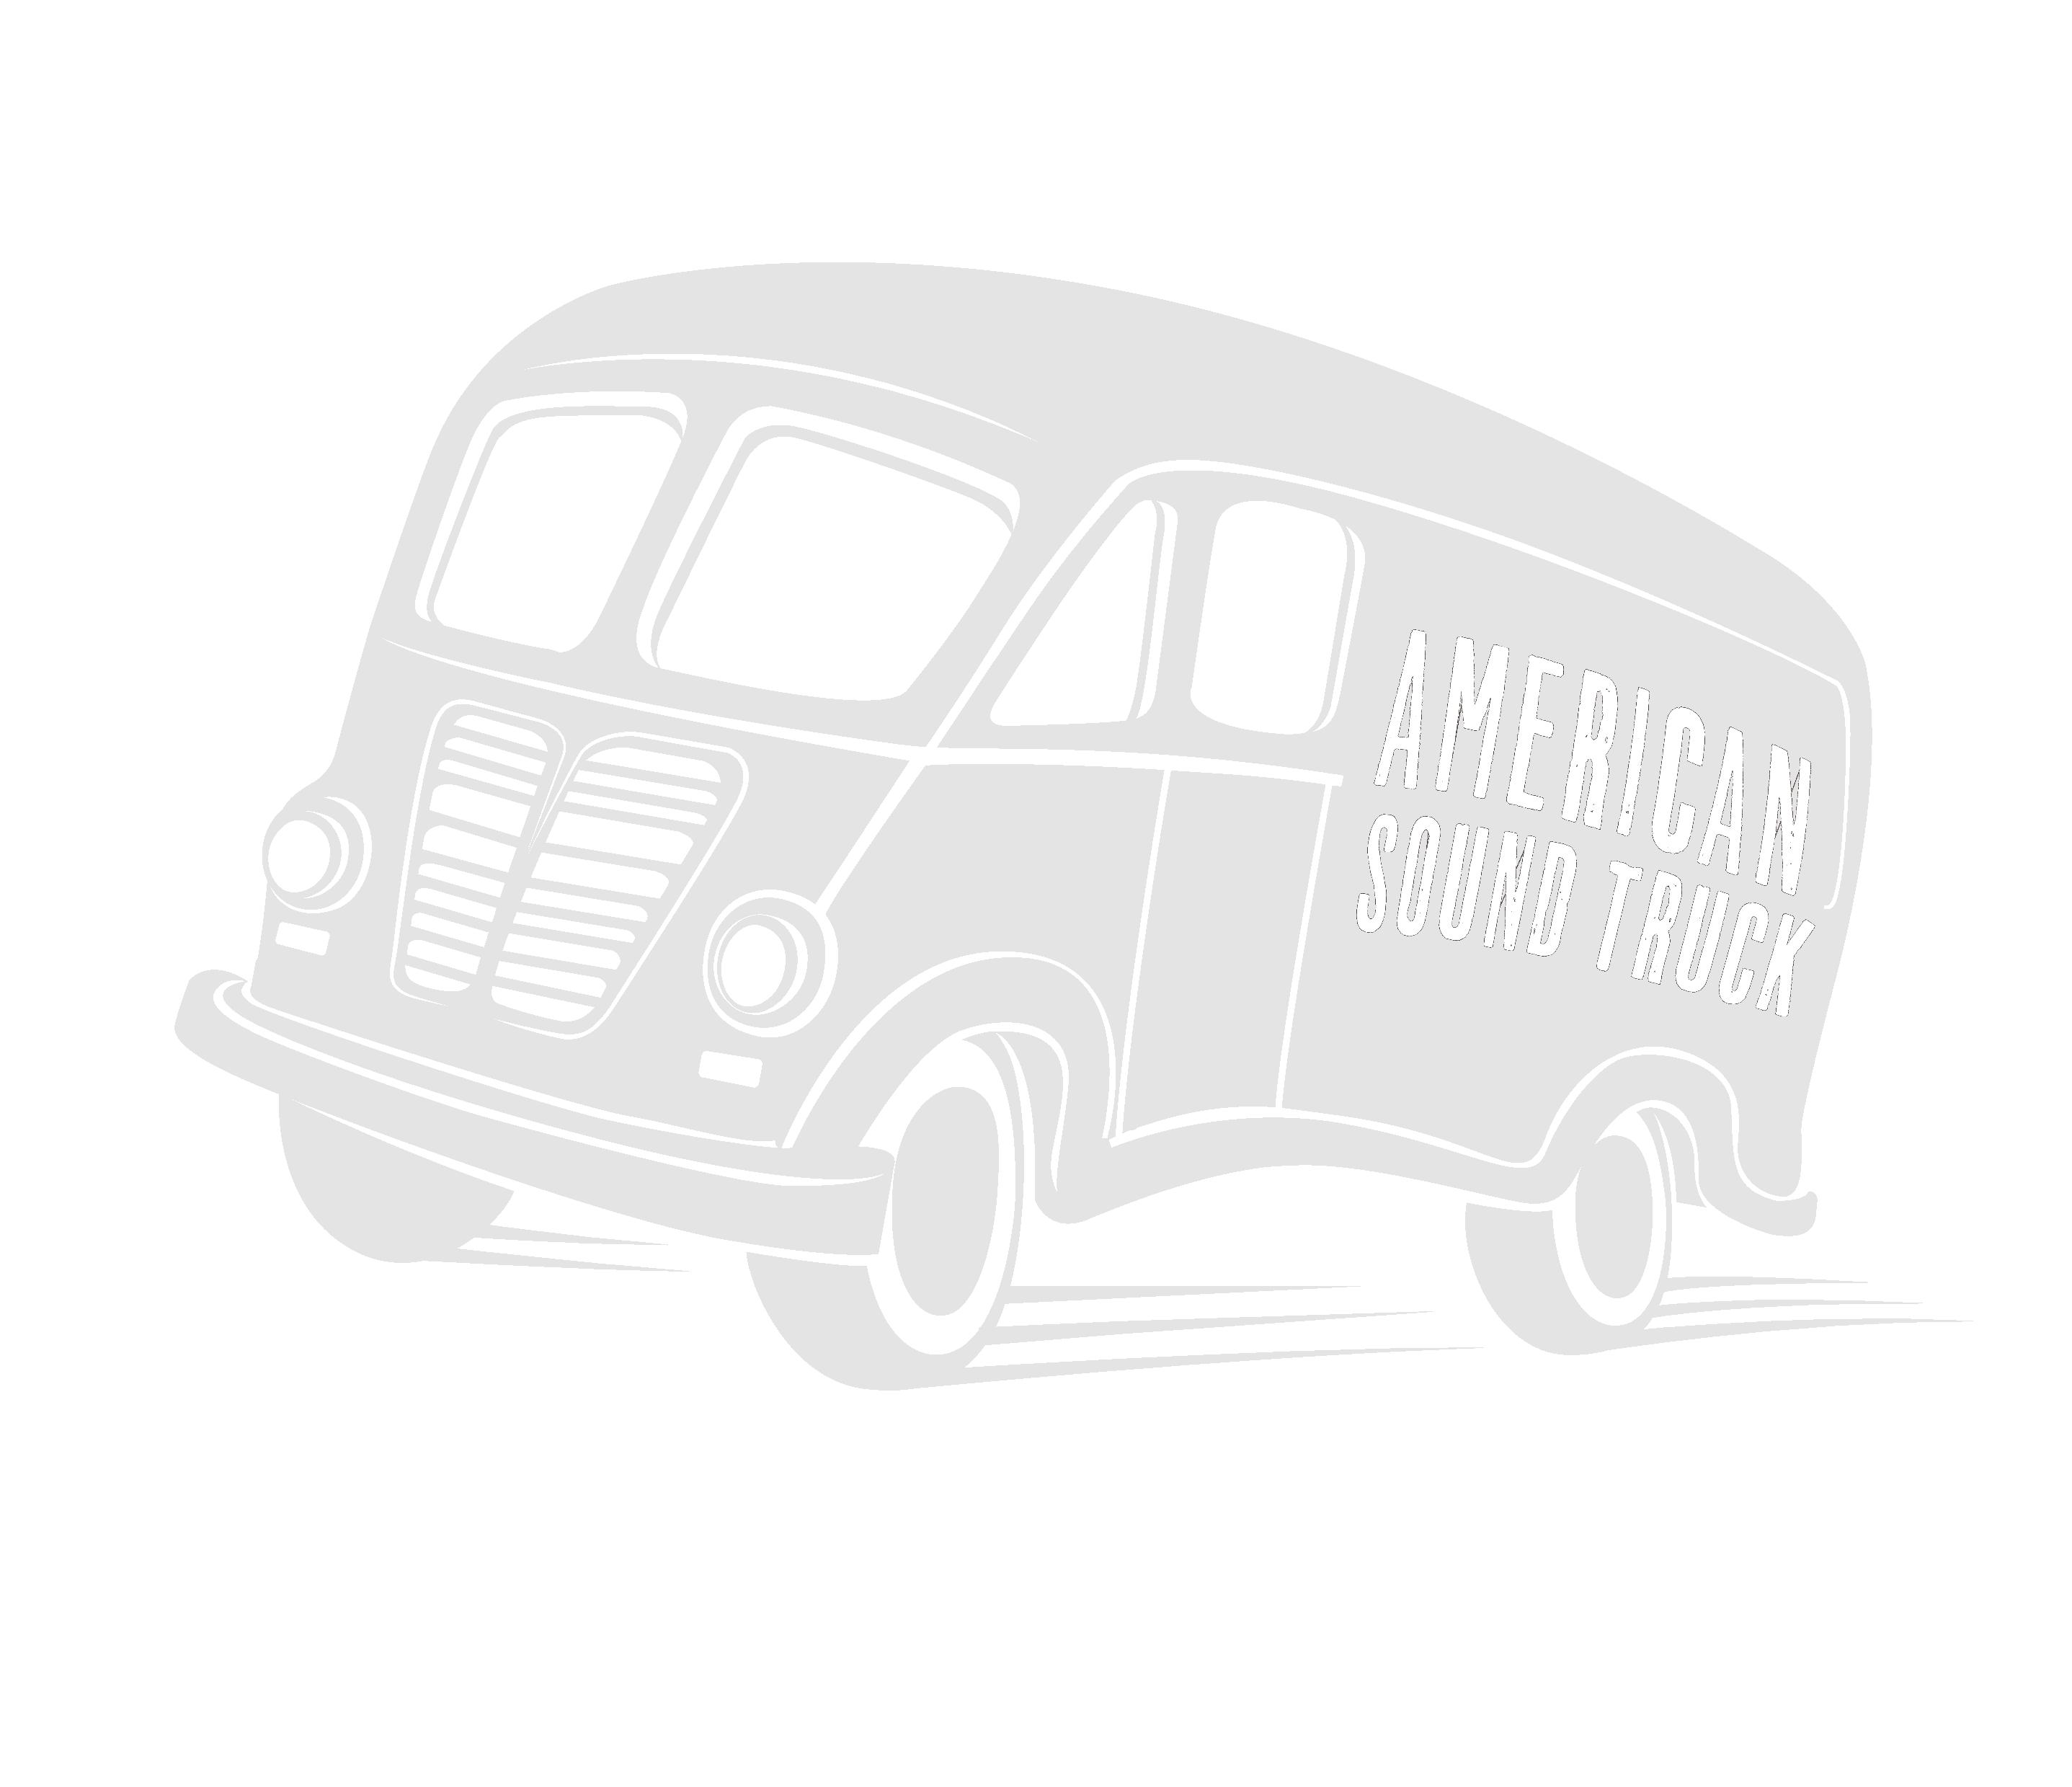 American Sound Truck